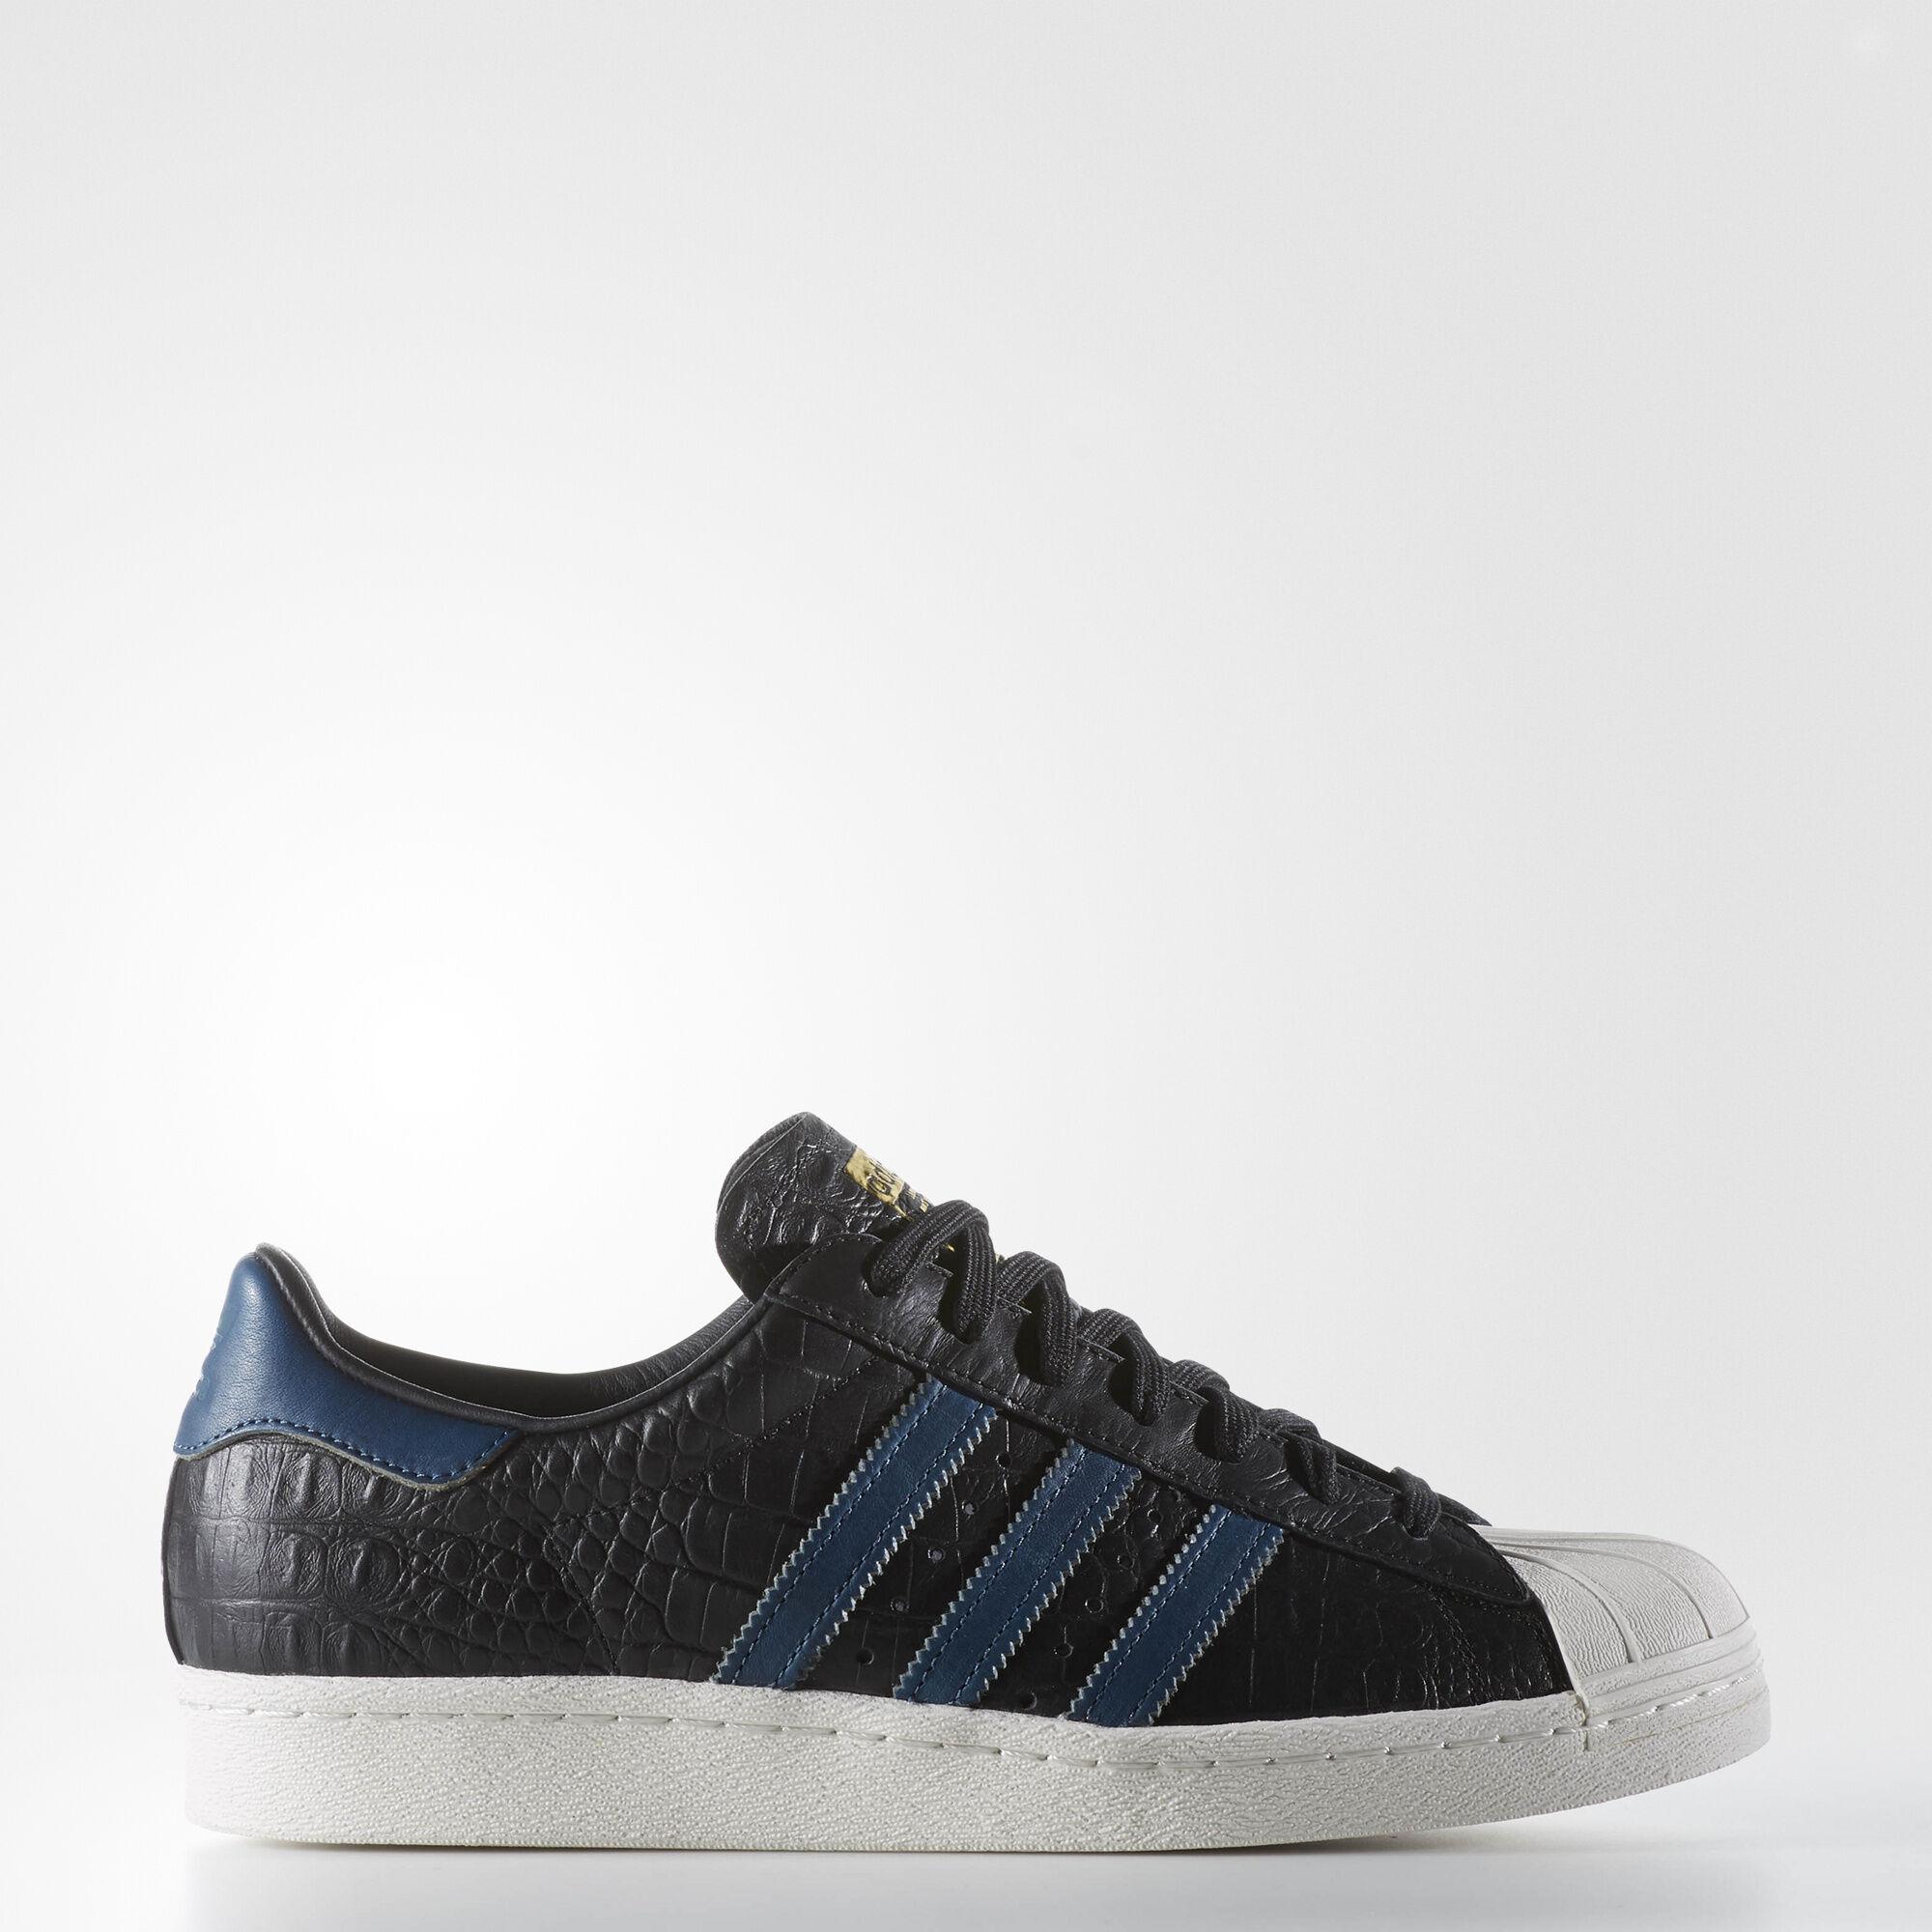 Adidas Superstar Eldridge herbusinessuk.co.uk